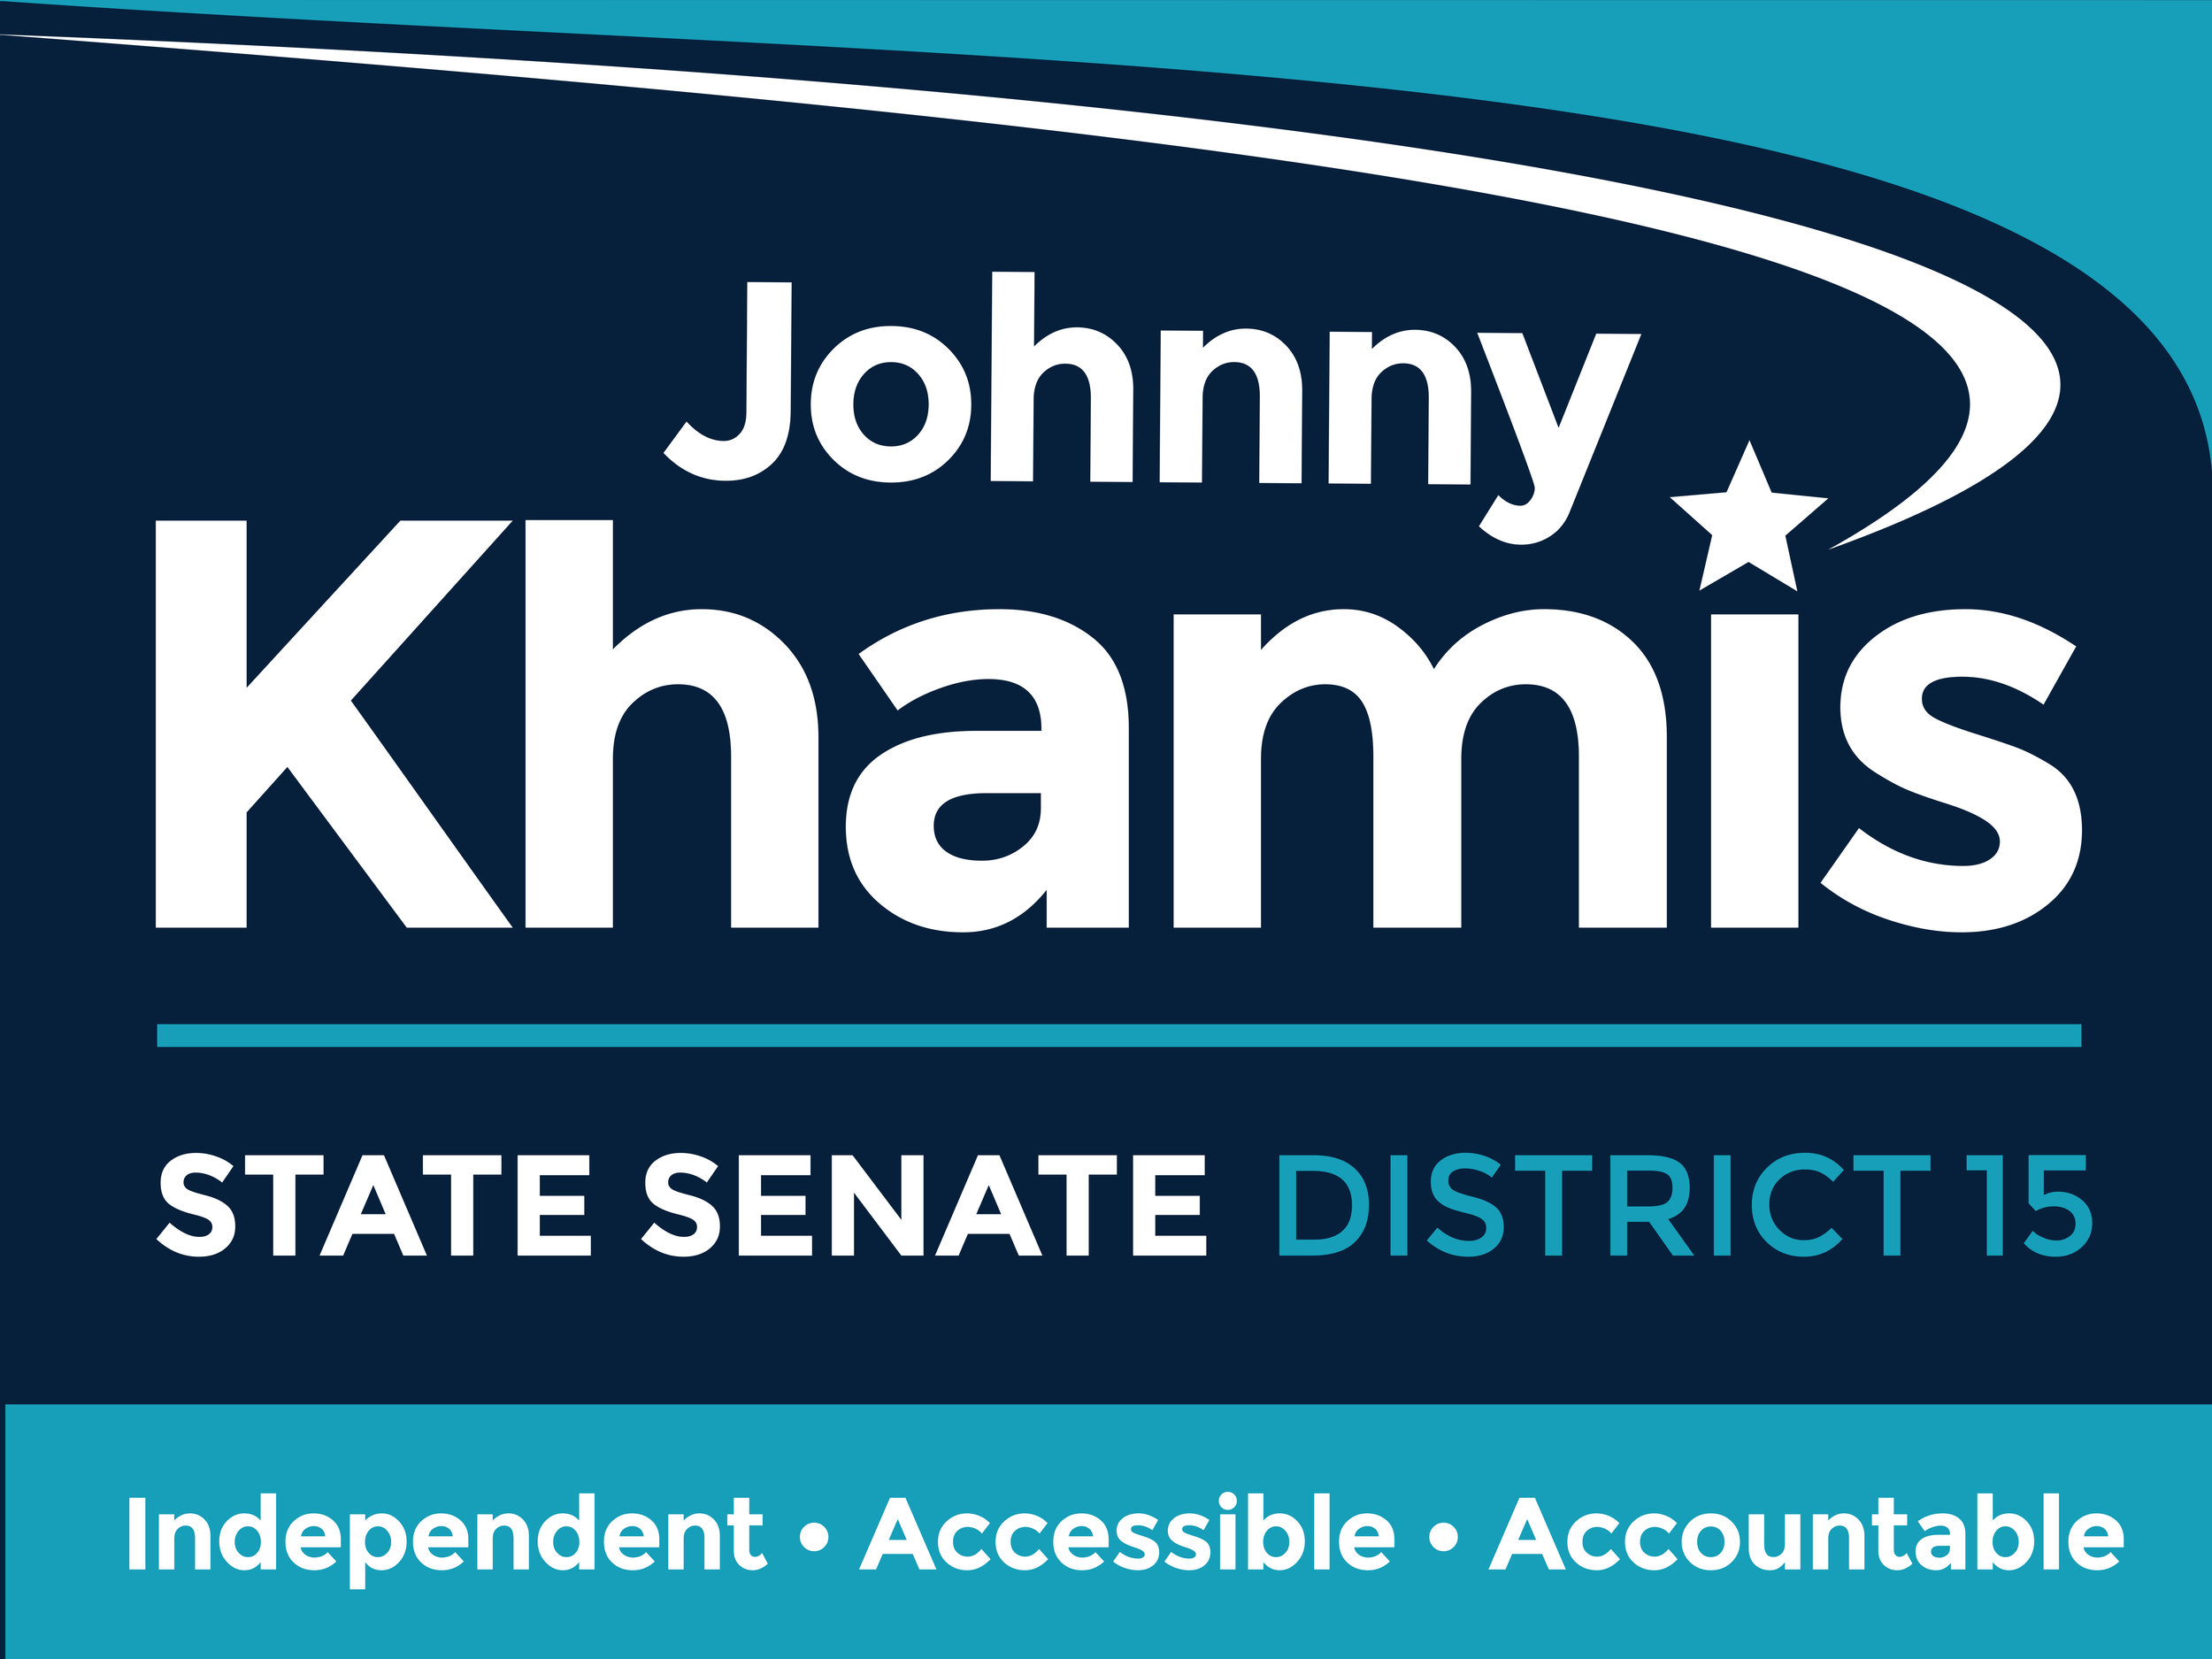 JohnnyKhamisStateSenate.jpg